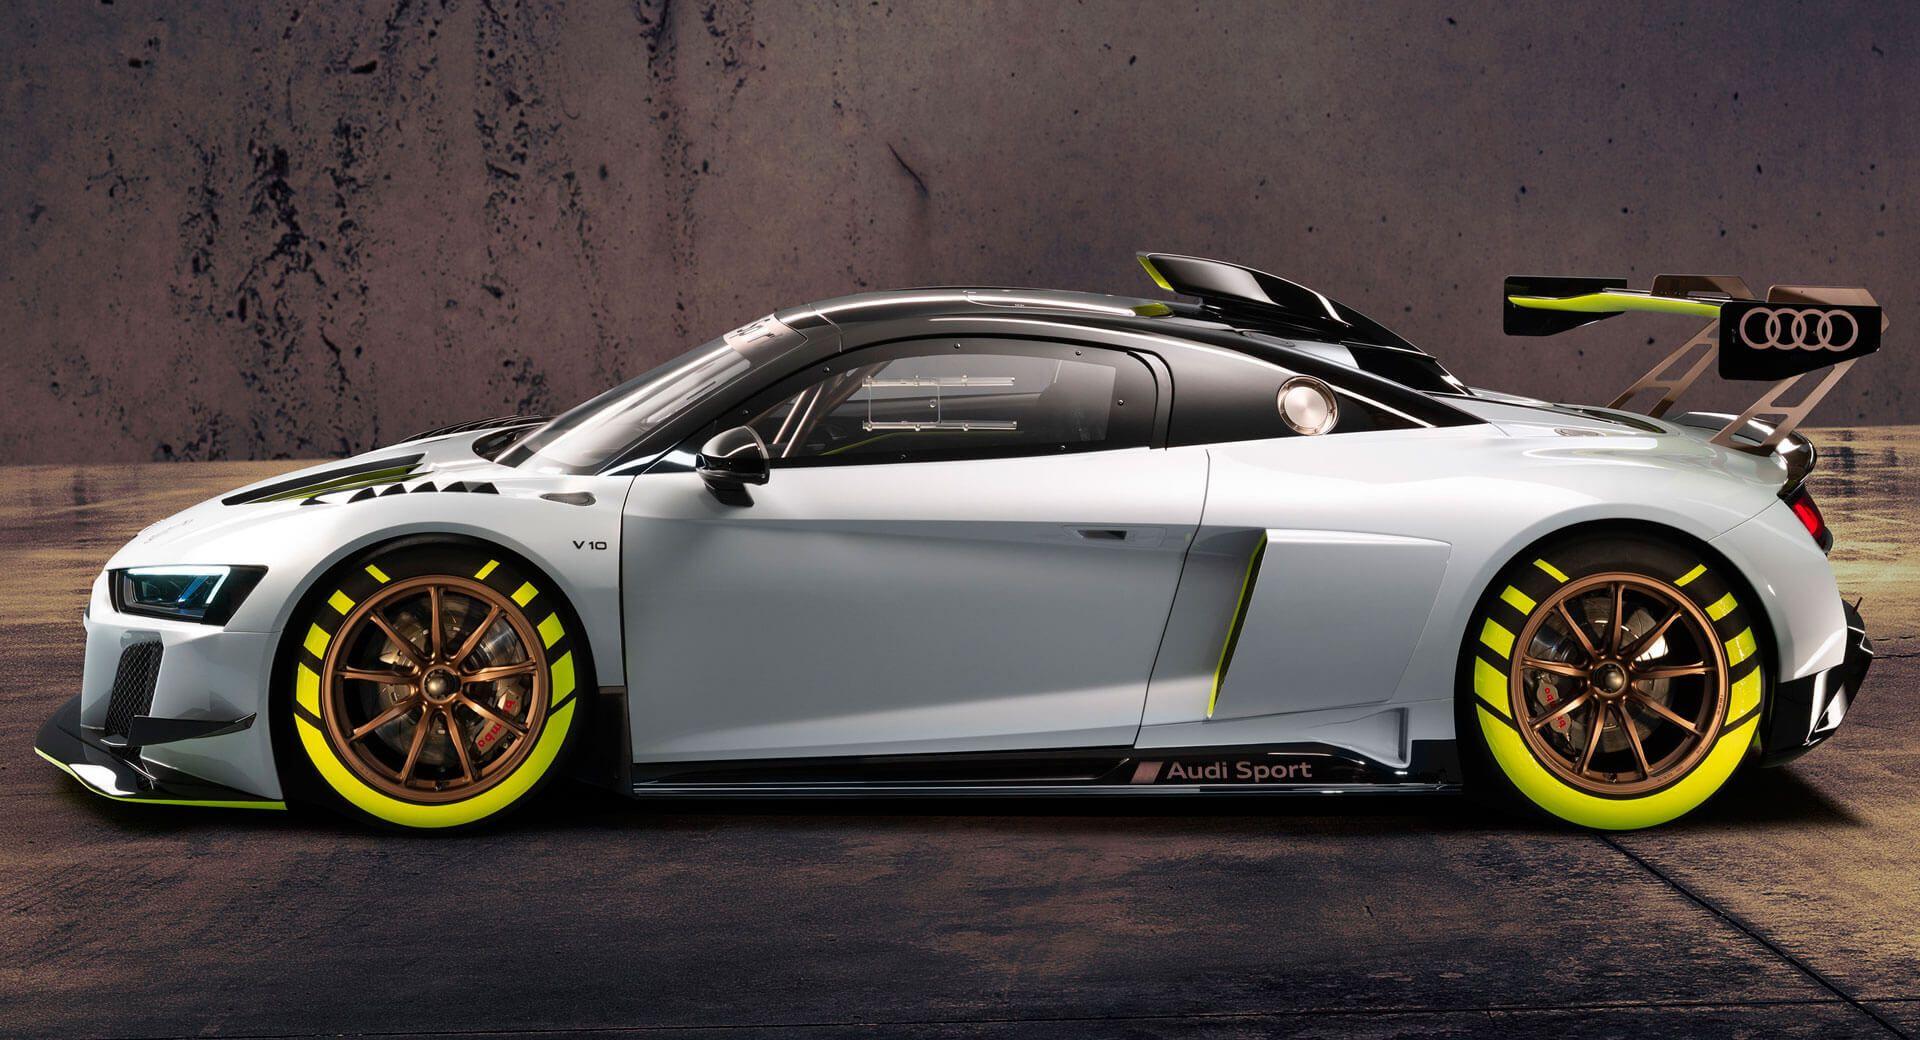 Audi R8 Lms Gt2 Racer Gets U S Visa 400k Price Tag In 2020 Racewagens